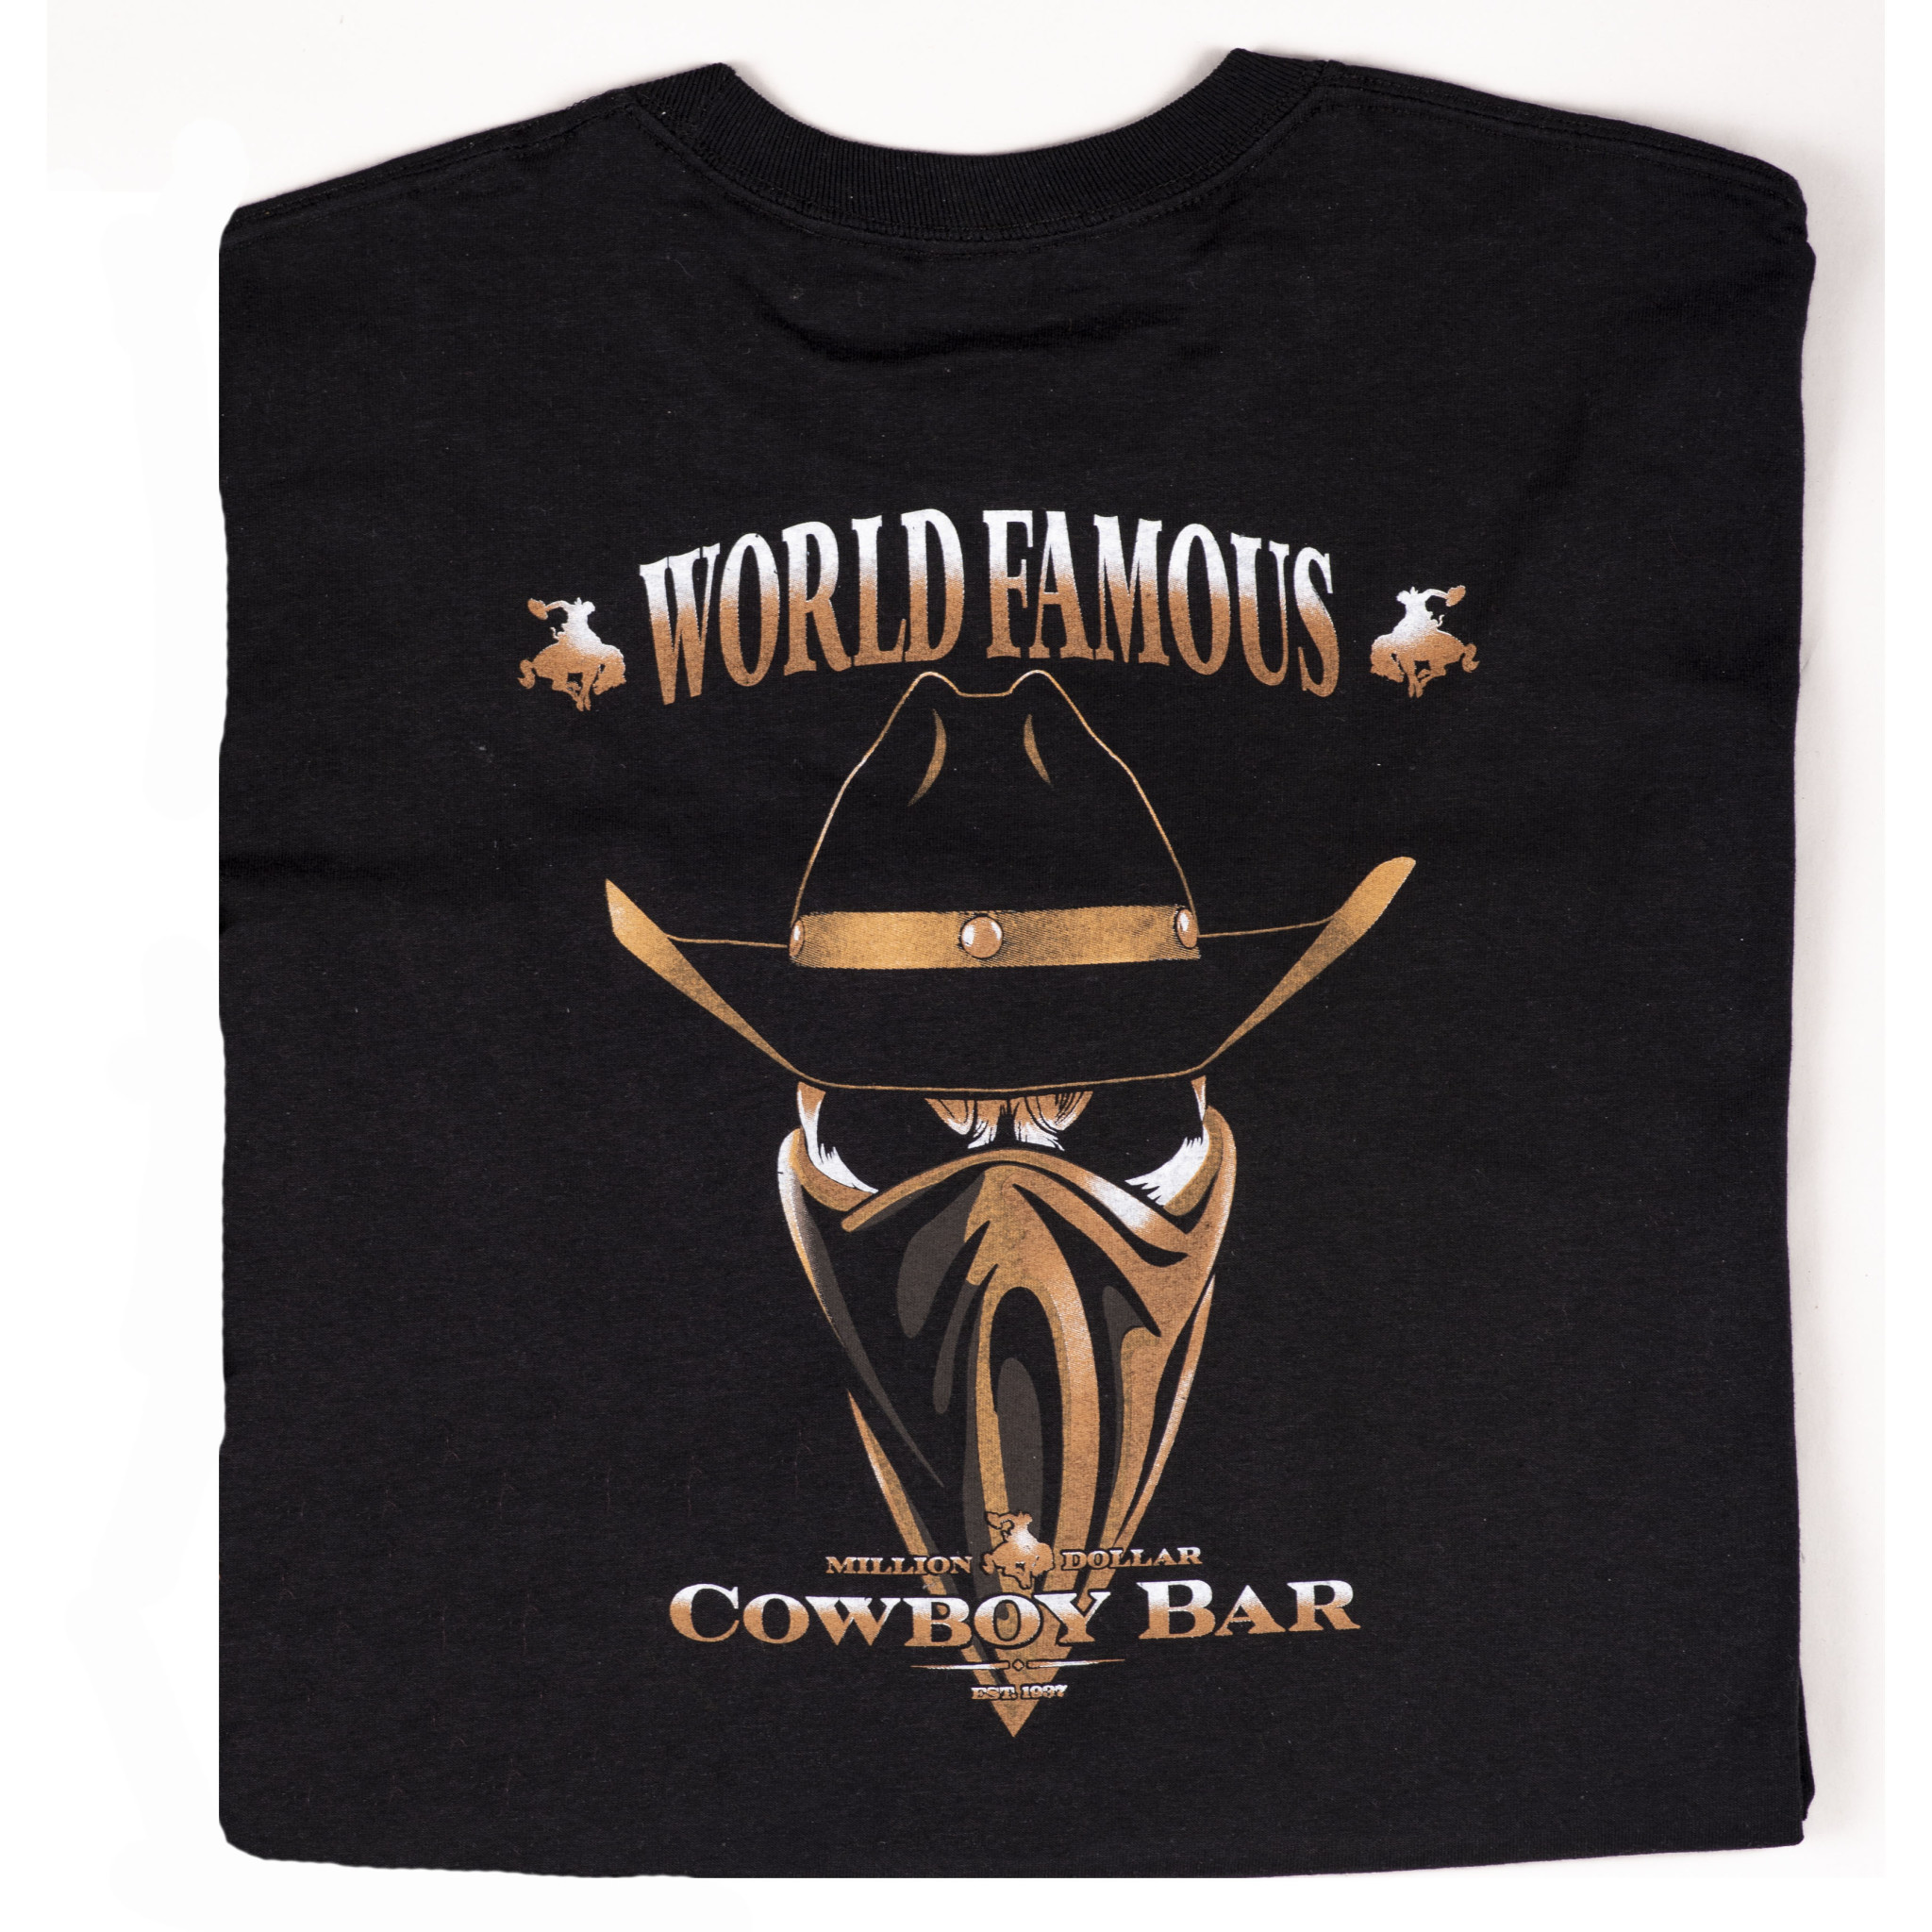 Black Bandit Shirt